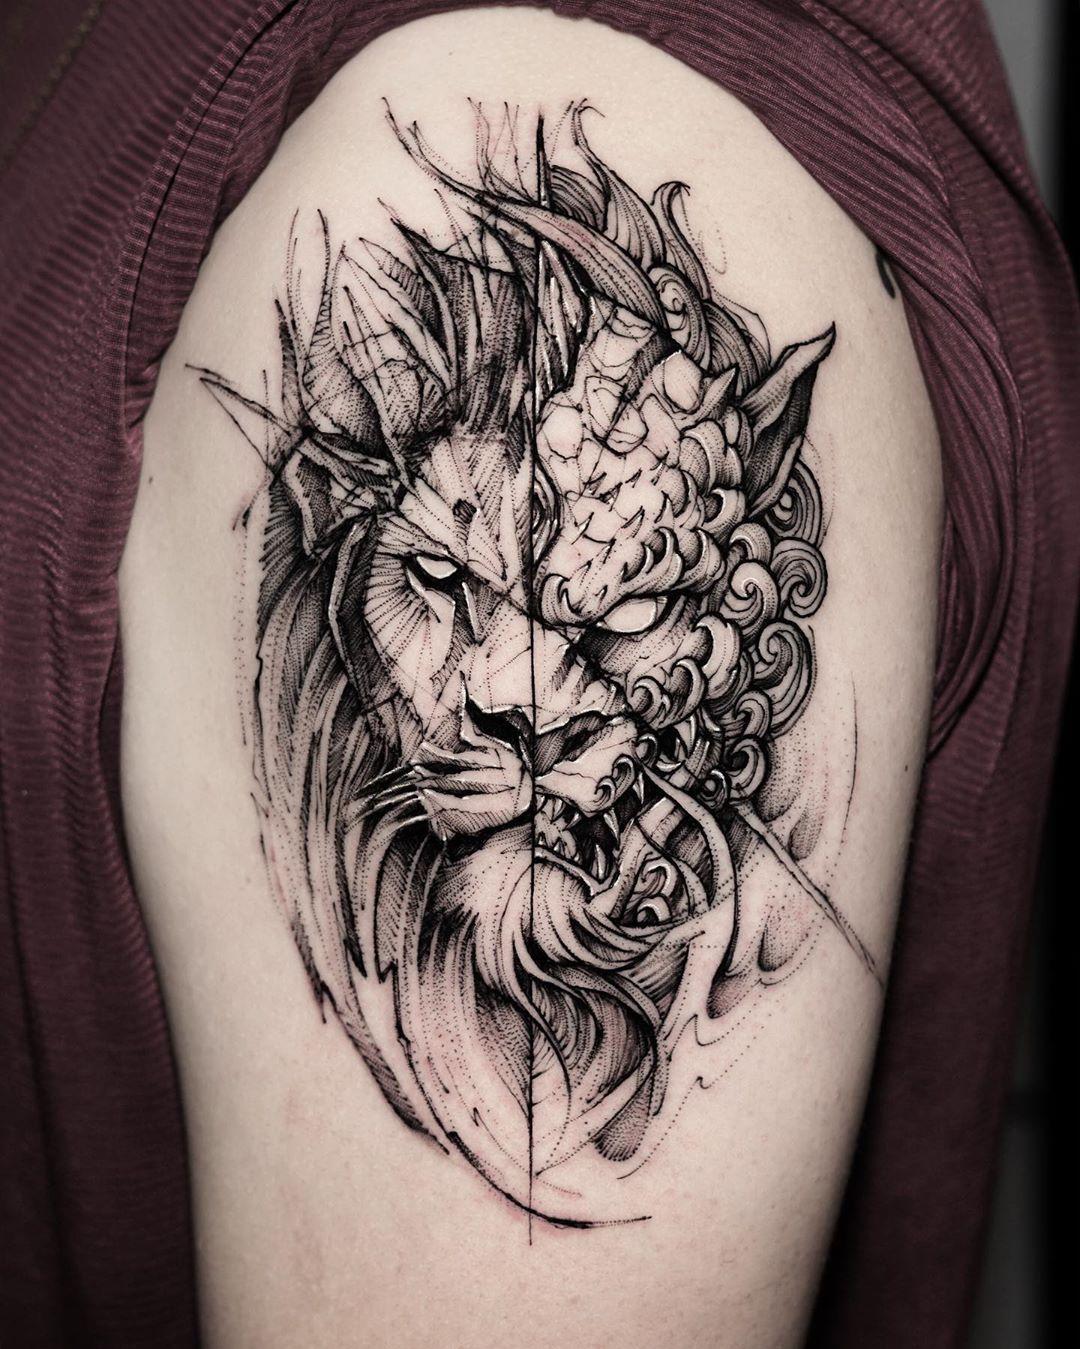 Lion And Foo Dog Chinese Guardian Lions Done At Bk Inkstudio Killersilverink Sketch Style Tattoos Foo Dog Tattoo Body Art Tattoos